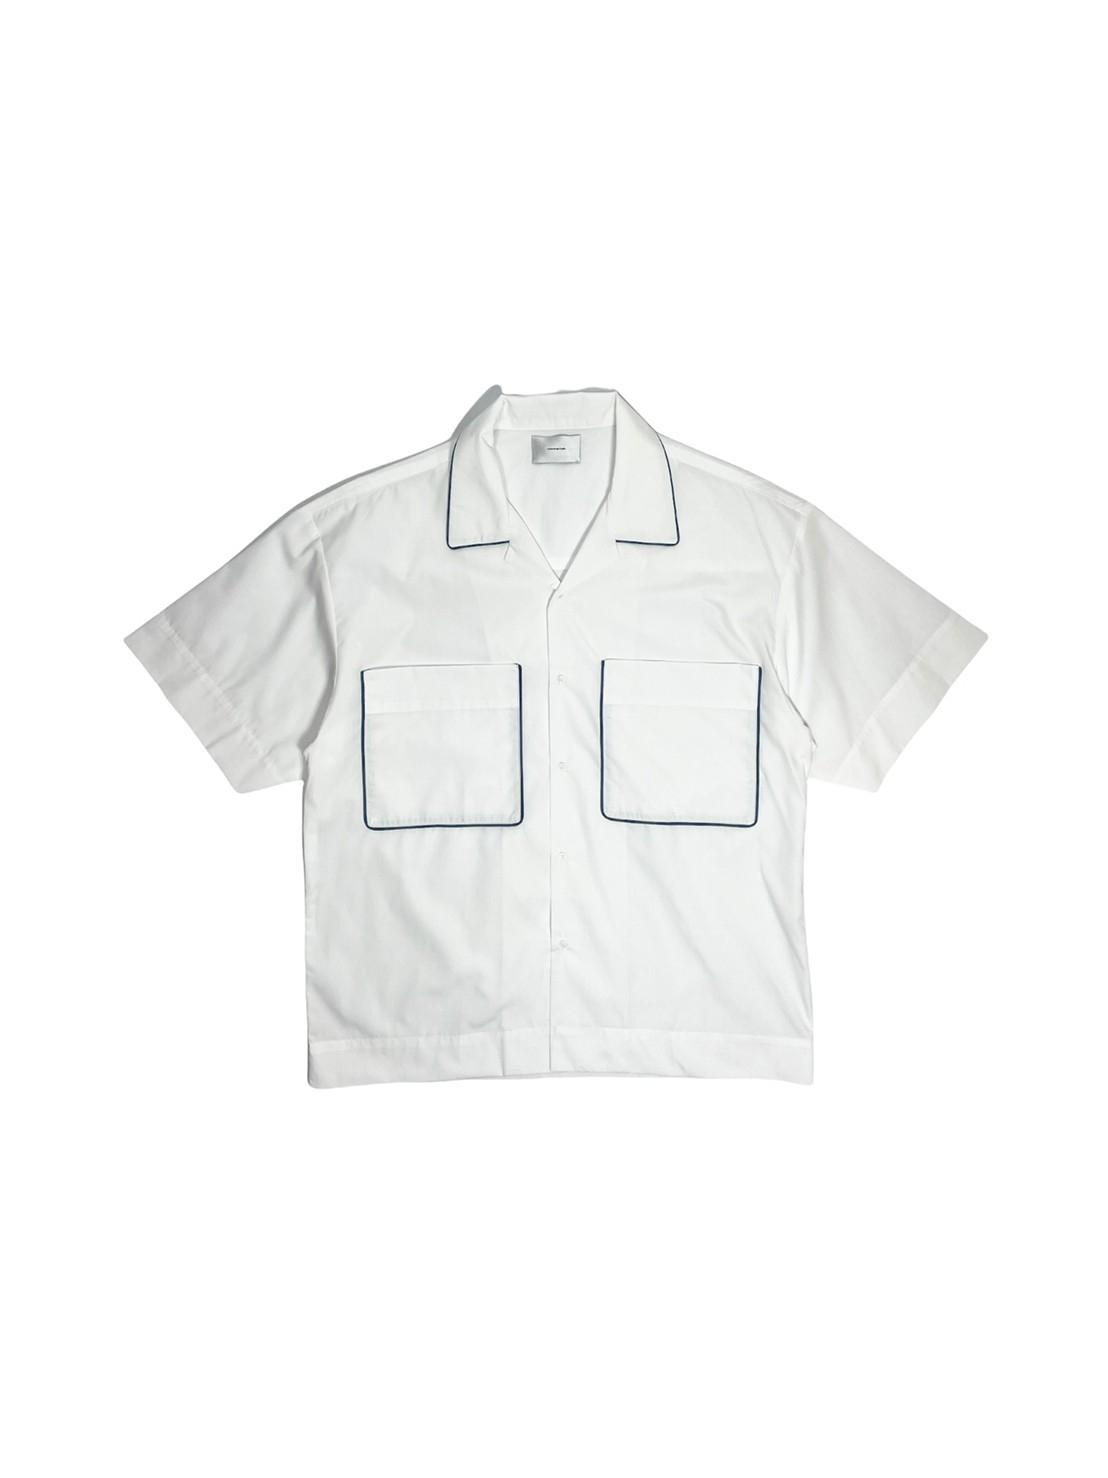 Luca Shirts (White)